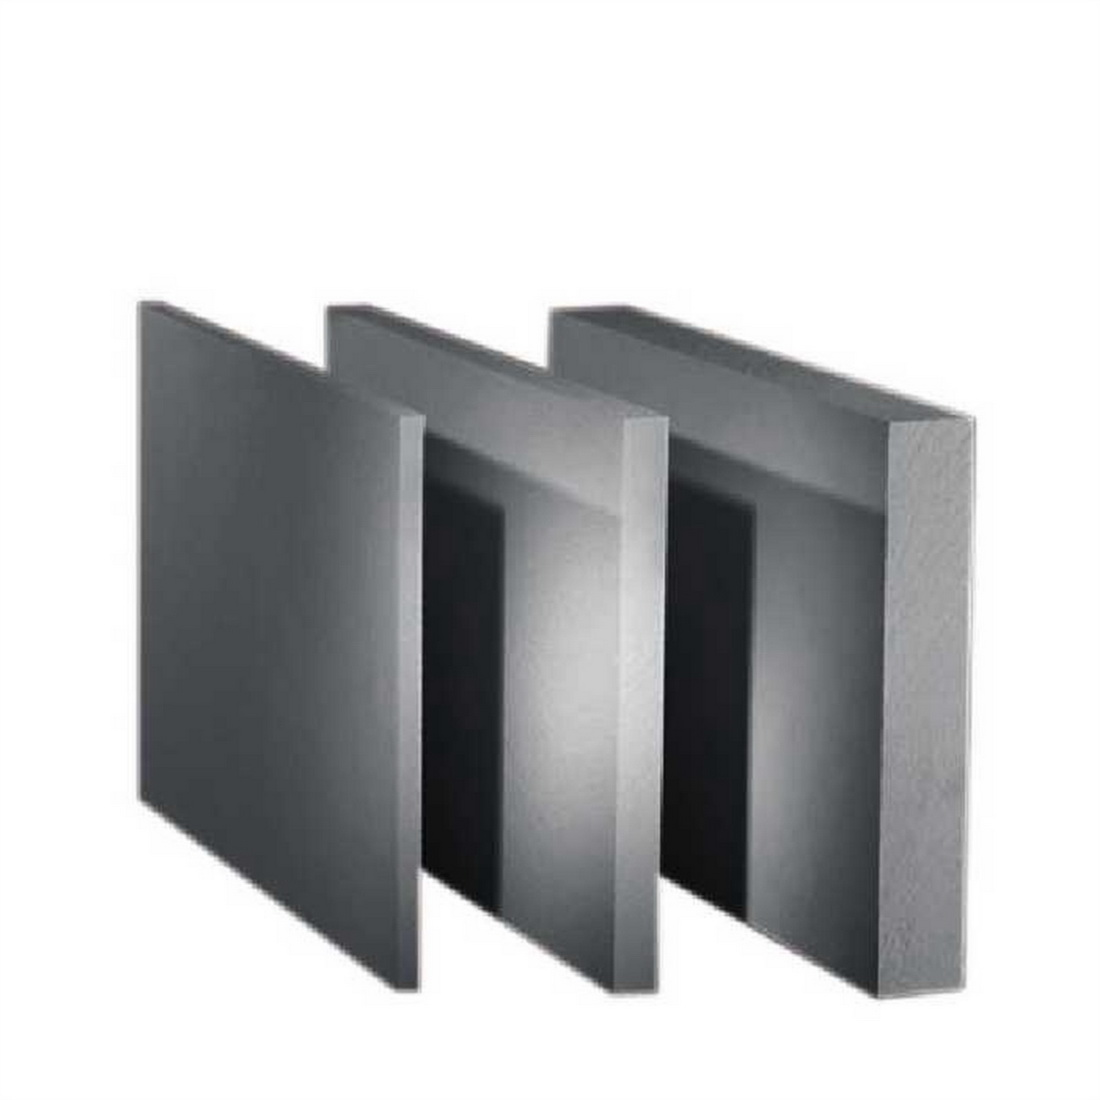 Expol Platinum Board 2400 x 1200 x 50mm R1.56 Black Expanded Polystyrene N2450